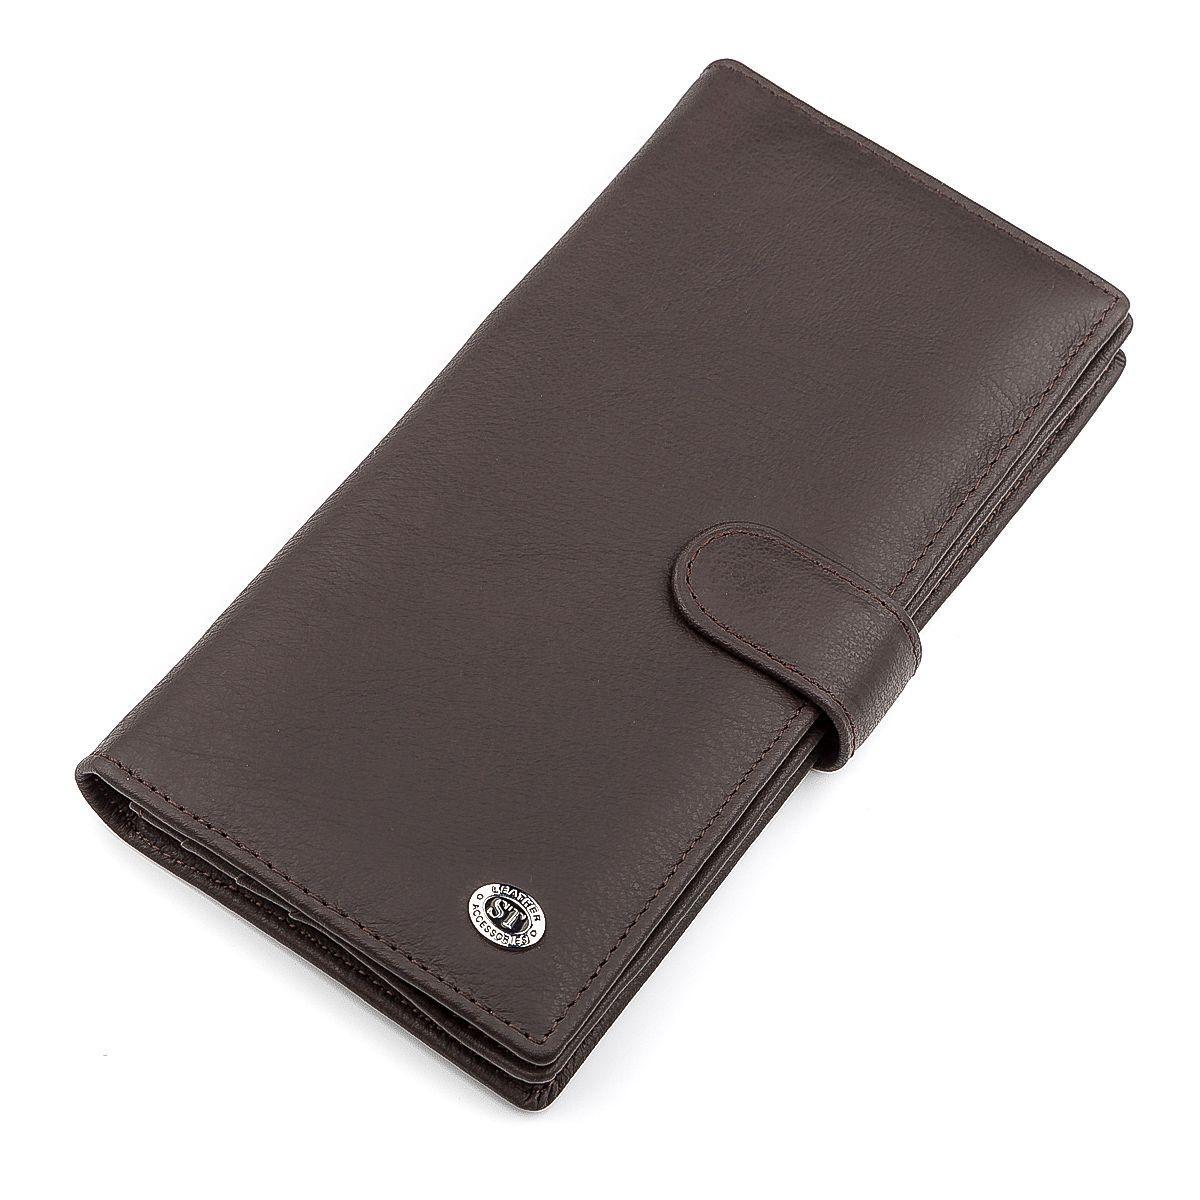 9db48edc7d02 Мужской купюрник ST Leather 18366 (ST147) из натуральной кожи Коричневый,  Коричневый